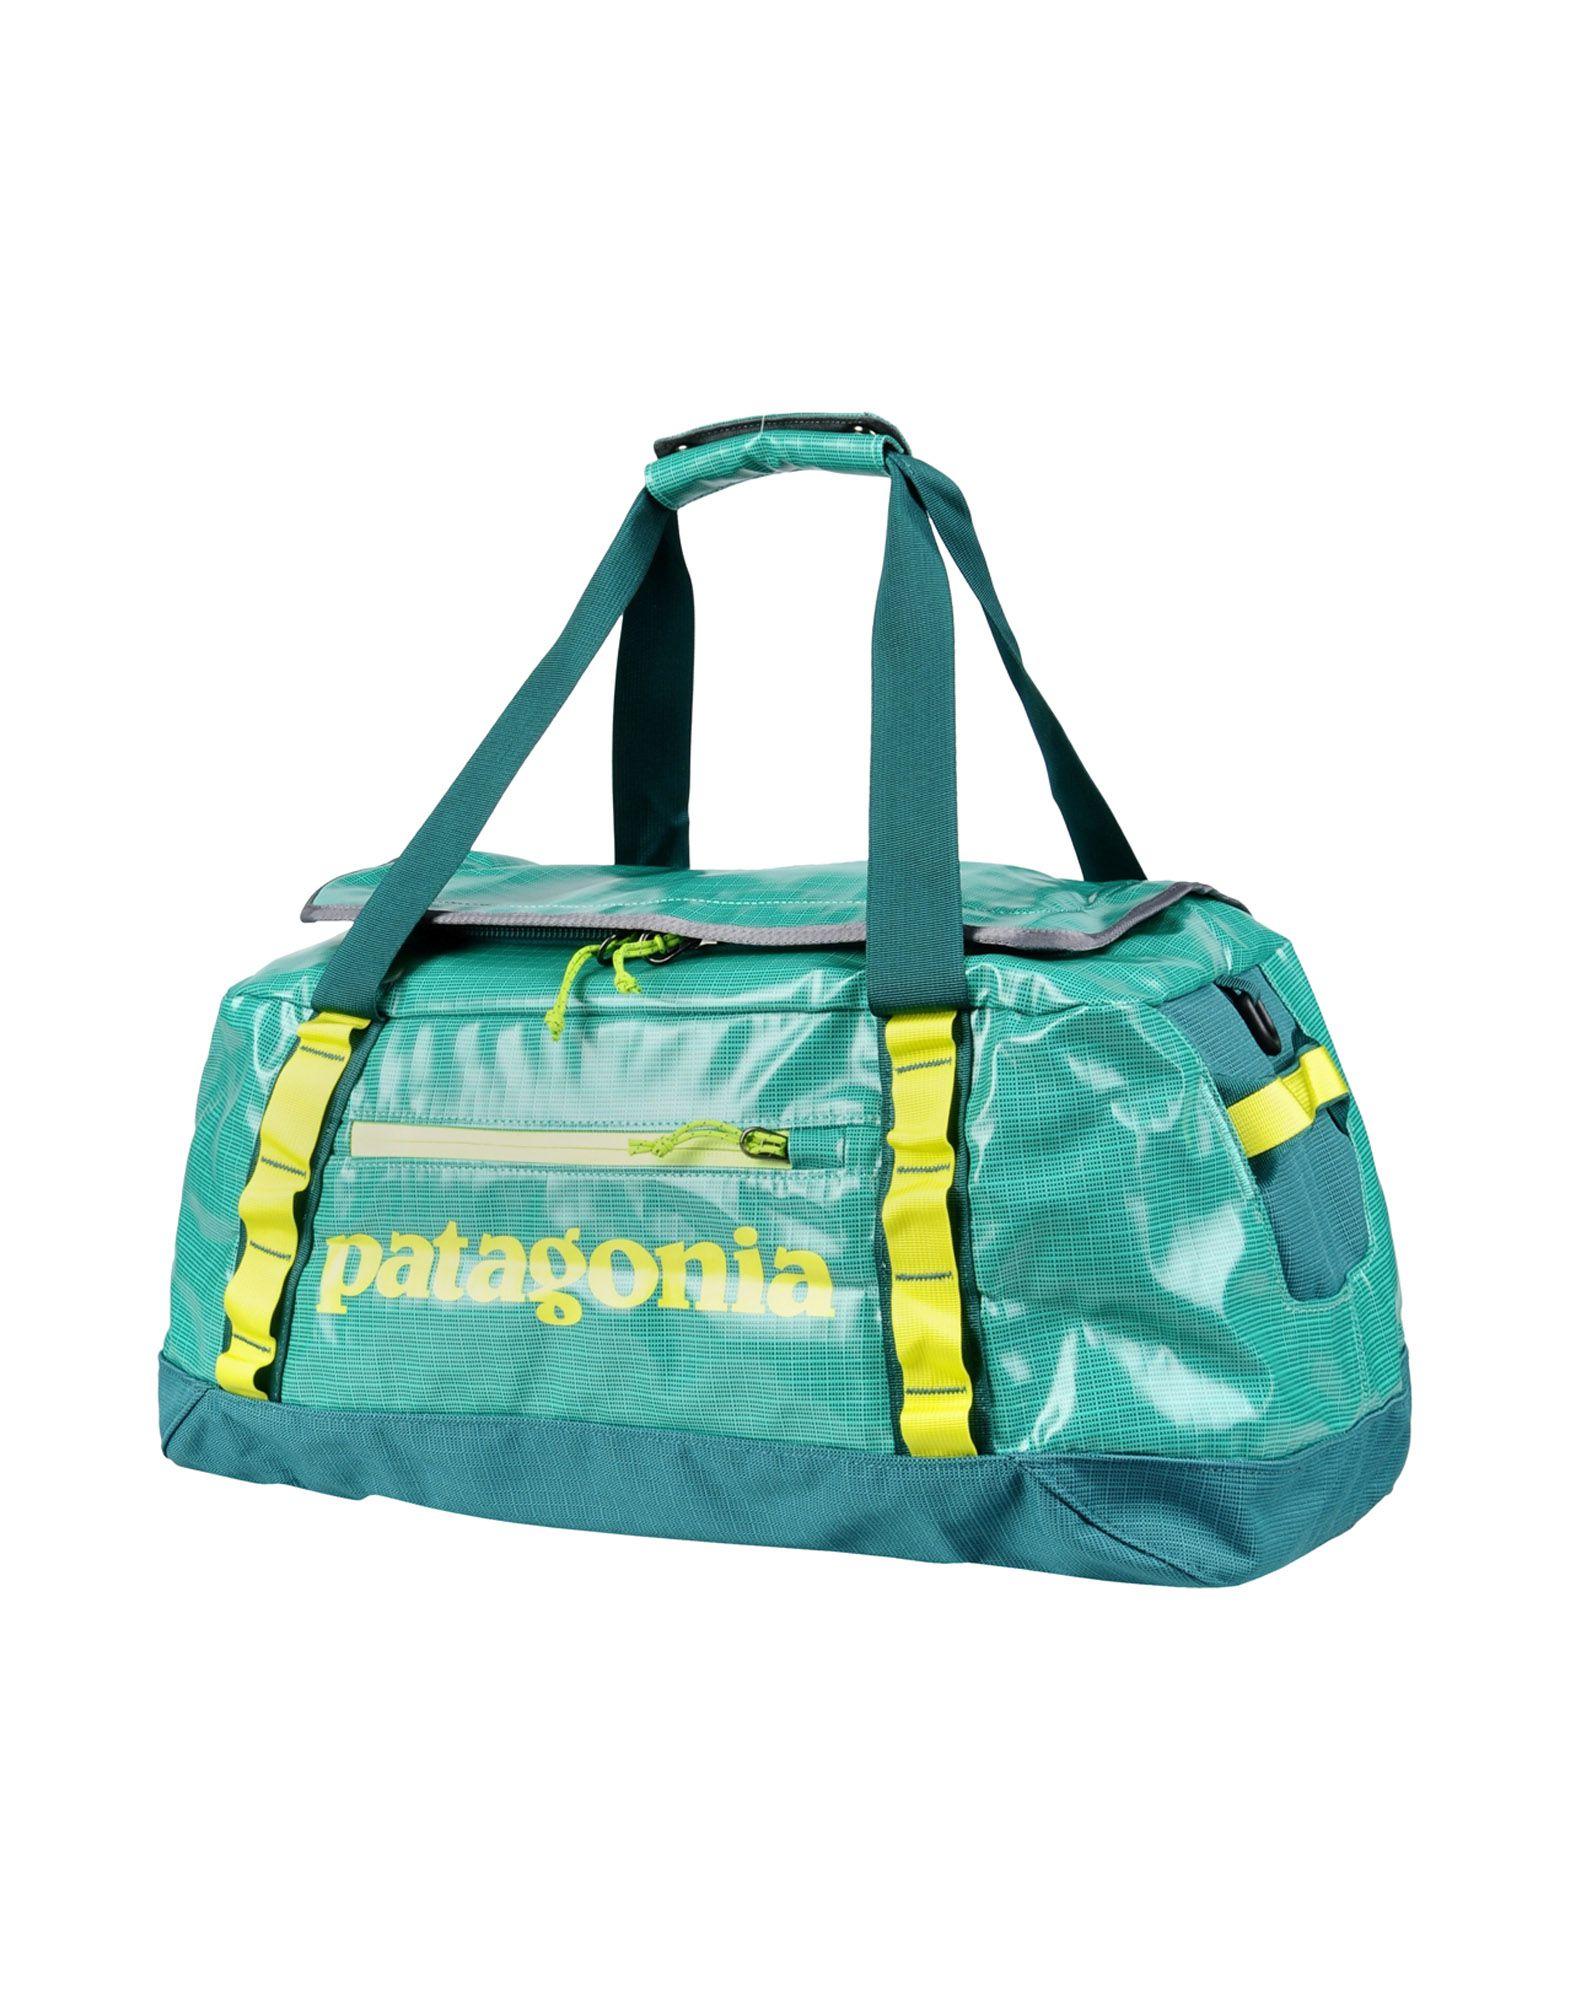 bc5381e60f65 Lyst - Patagonia Travel   Duffel Bag in Green for Men